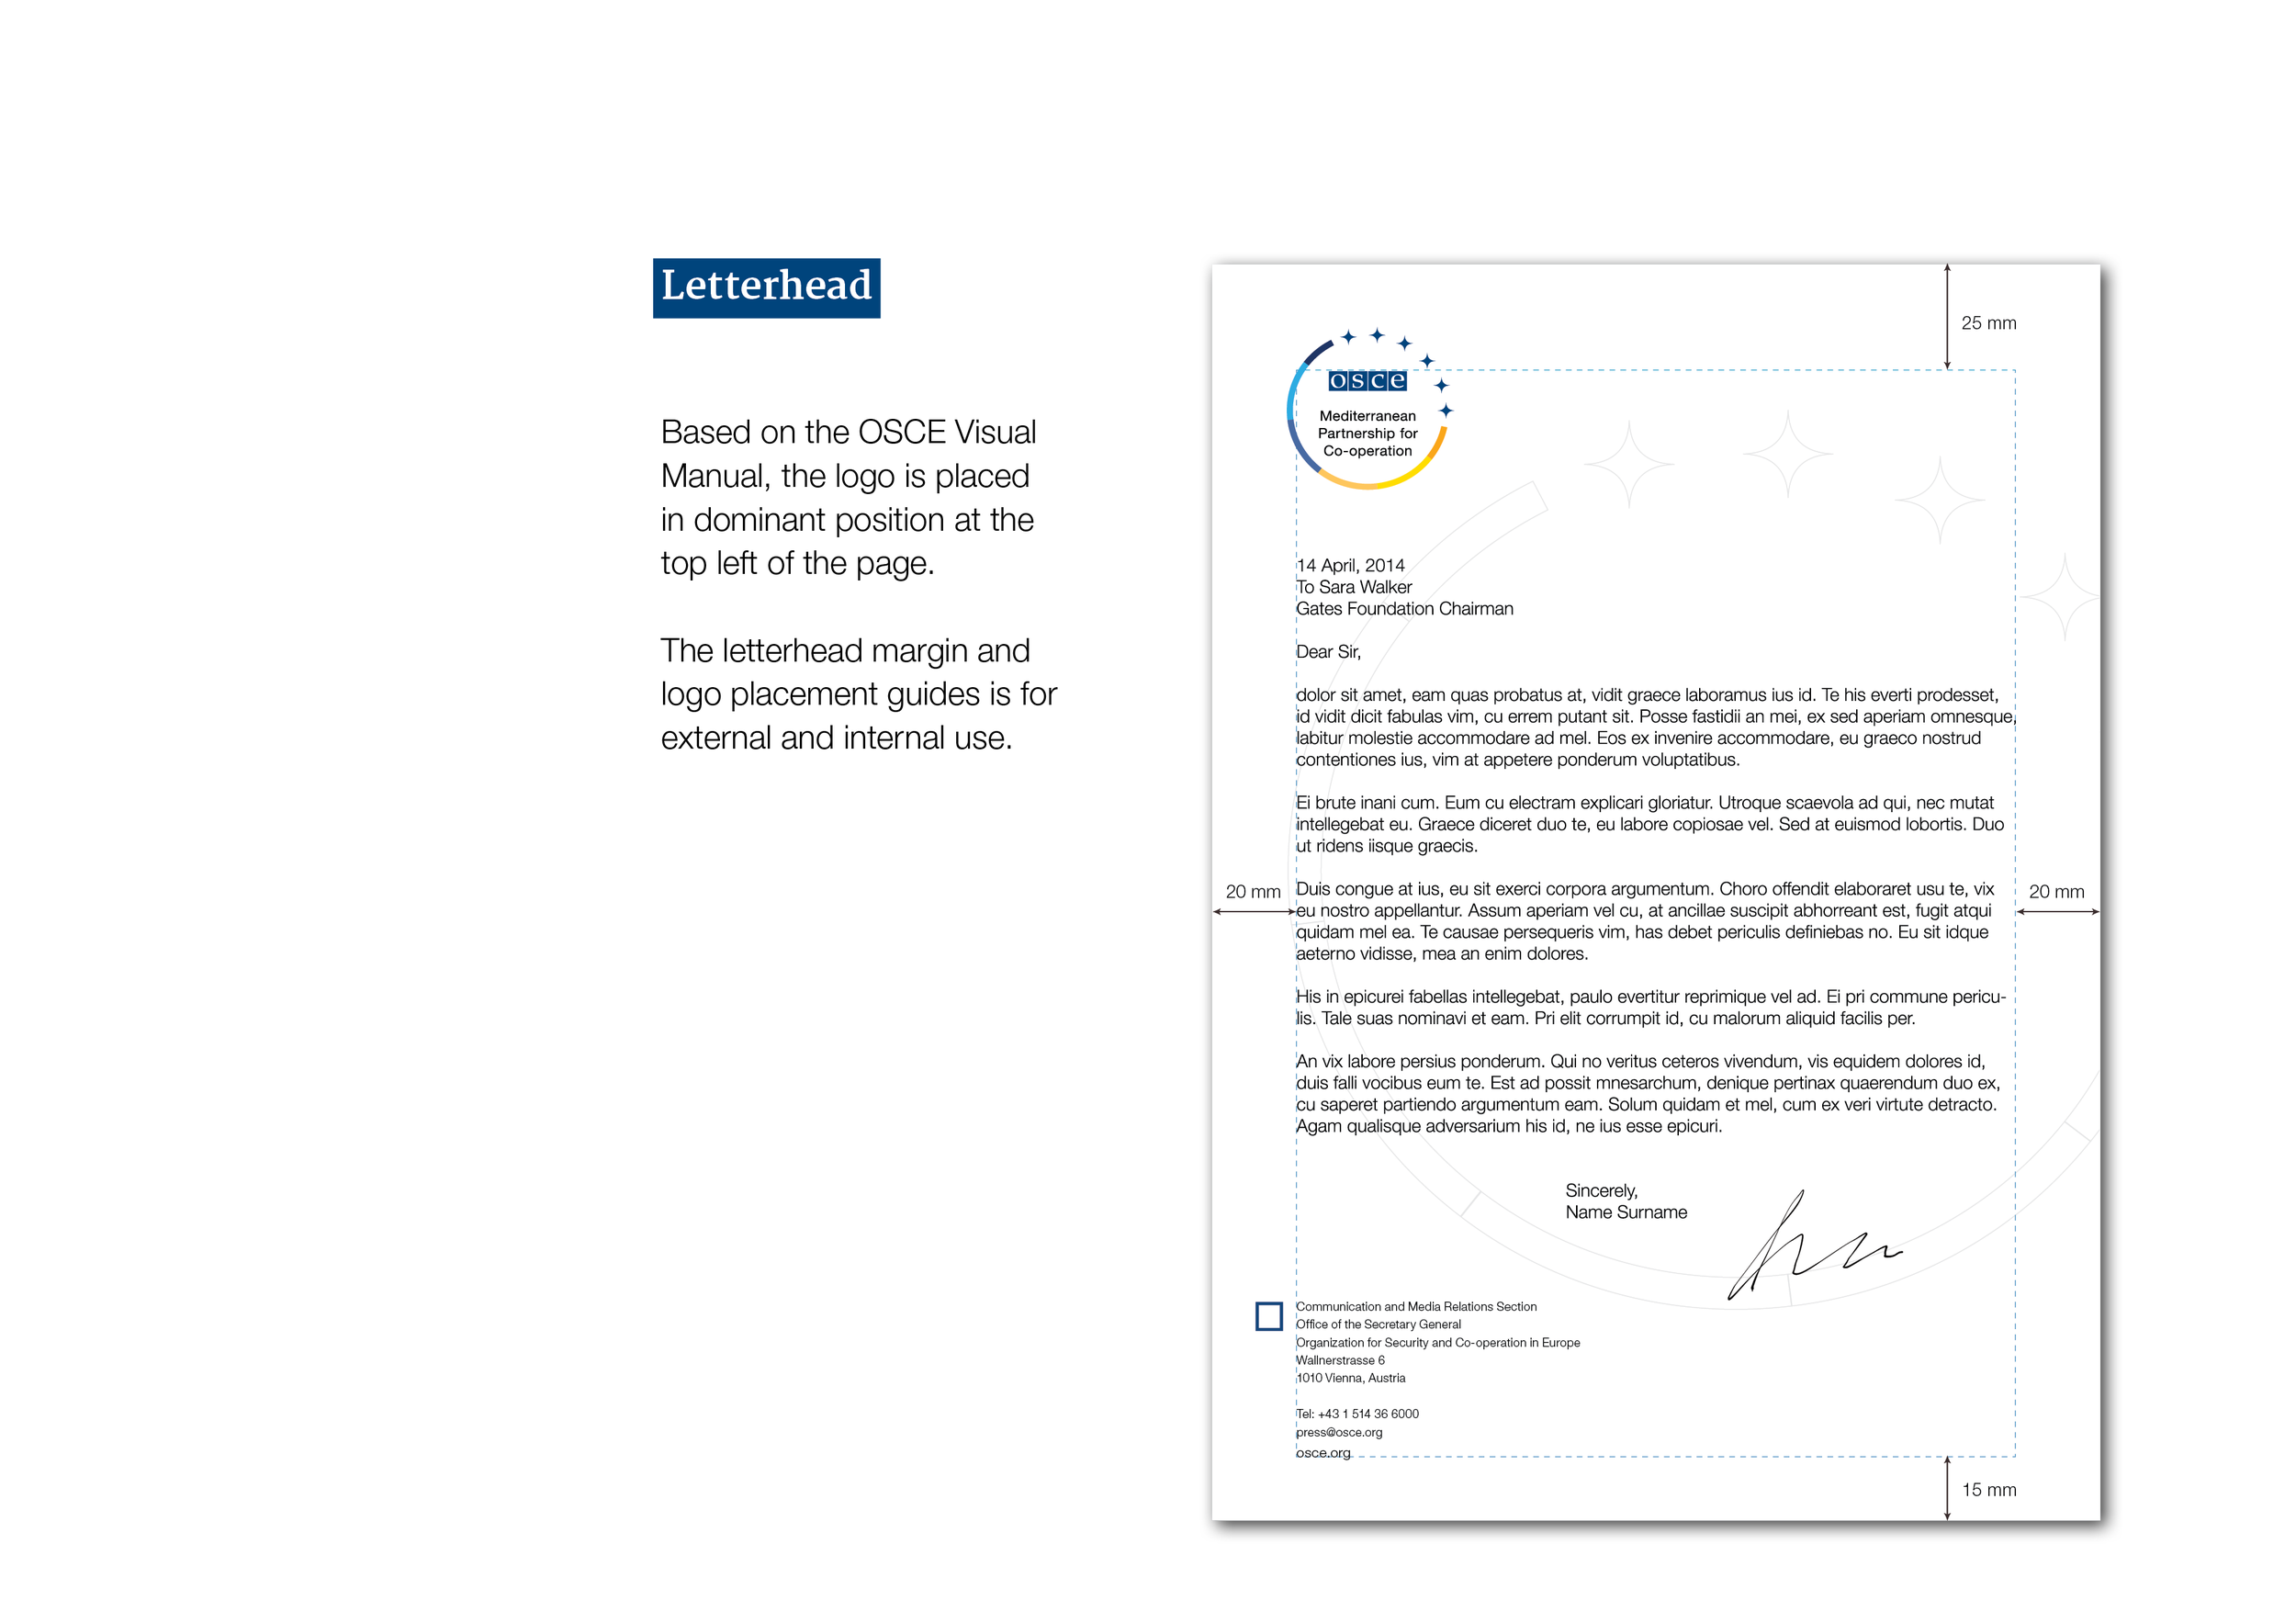 OSCE_Partnership_Logo_Graphic_Charter_31101622.png